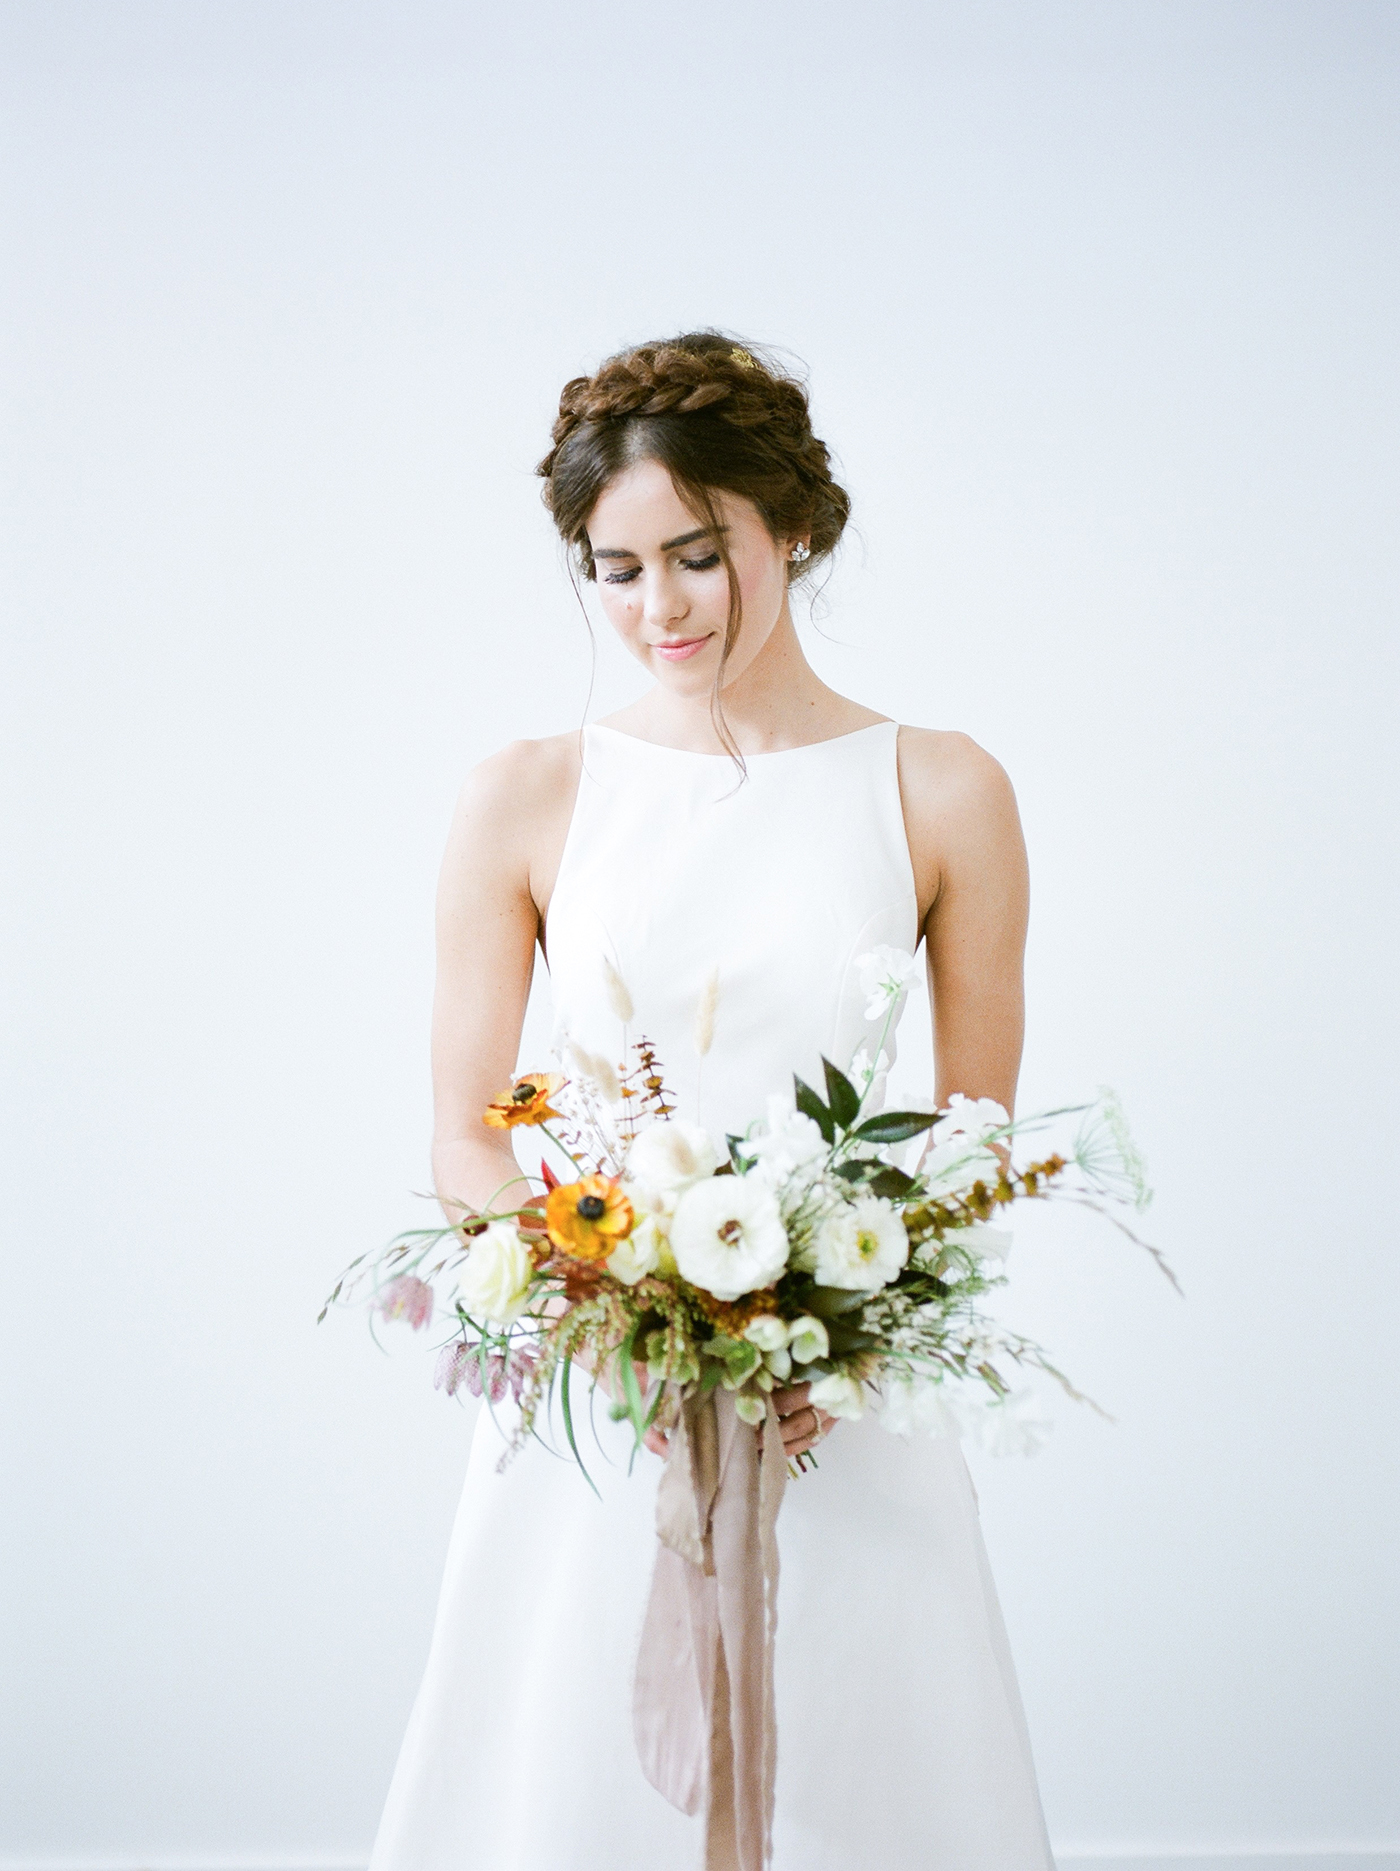 Wedding Floral Design Dallas - Olive Grove Design - Mimimalist Fall Wedding - 00059.jpg